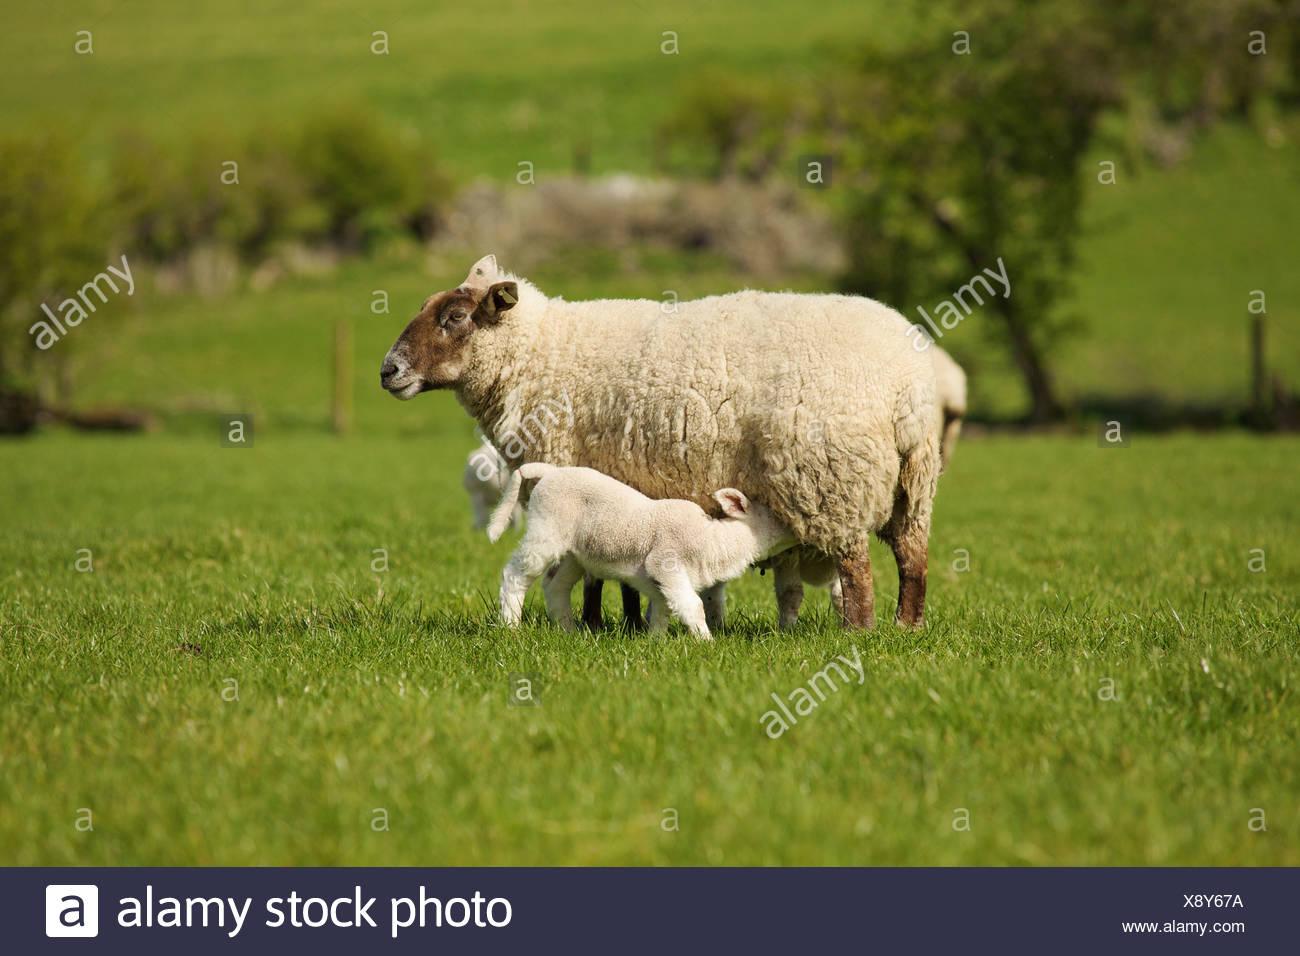 Lamb Nursing From Mother Sheep; Dublin County Dublin Ireland - Stock Image